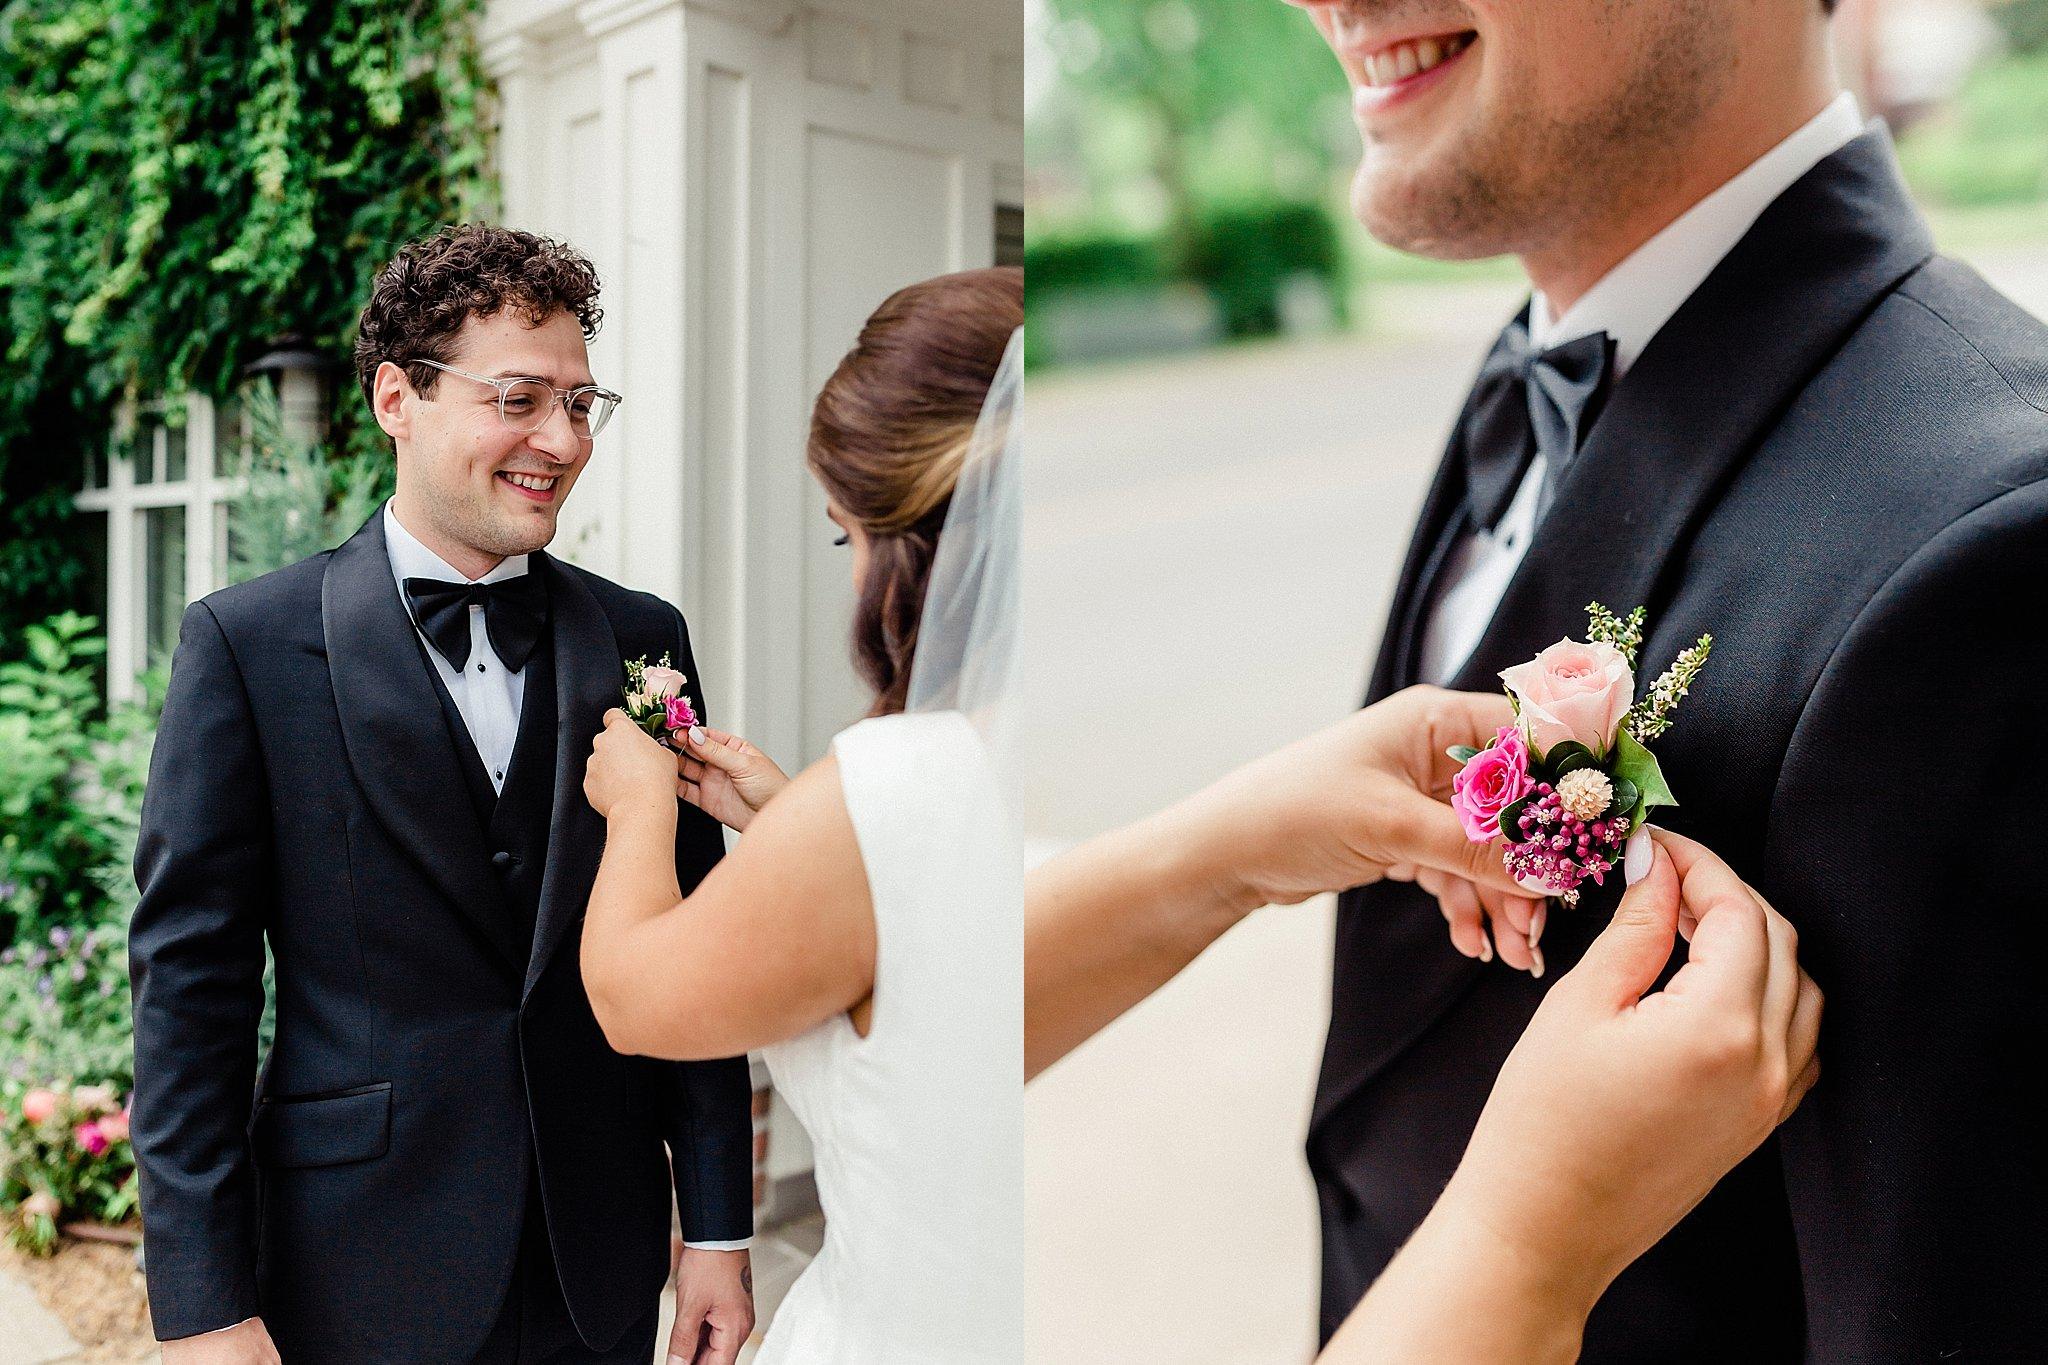 Durham Region Wedding Photographer, Toronto Wedding Photographer, Durham Region Film Photographer